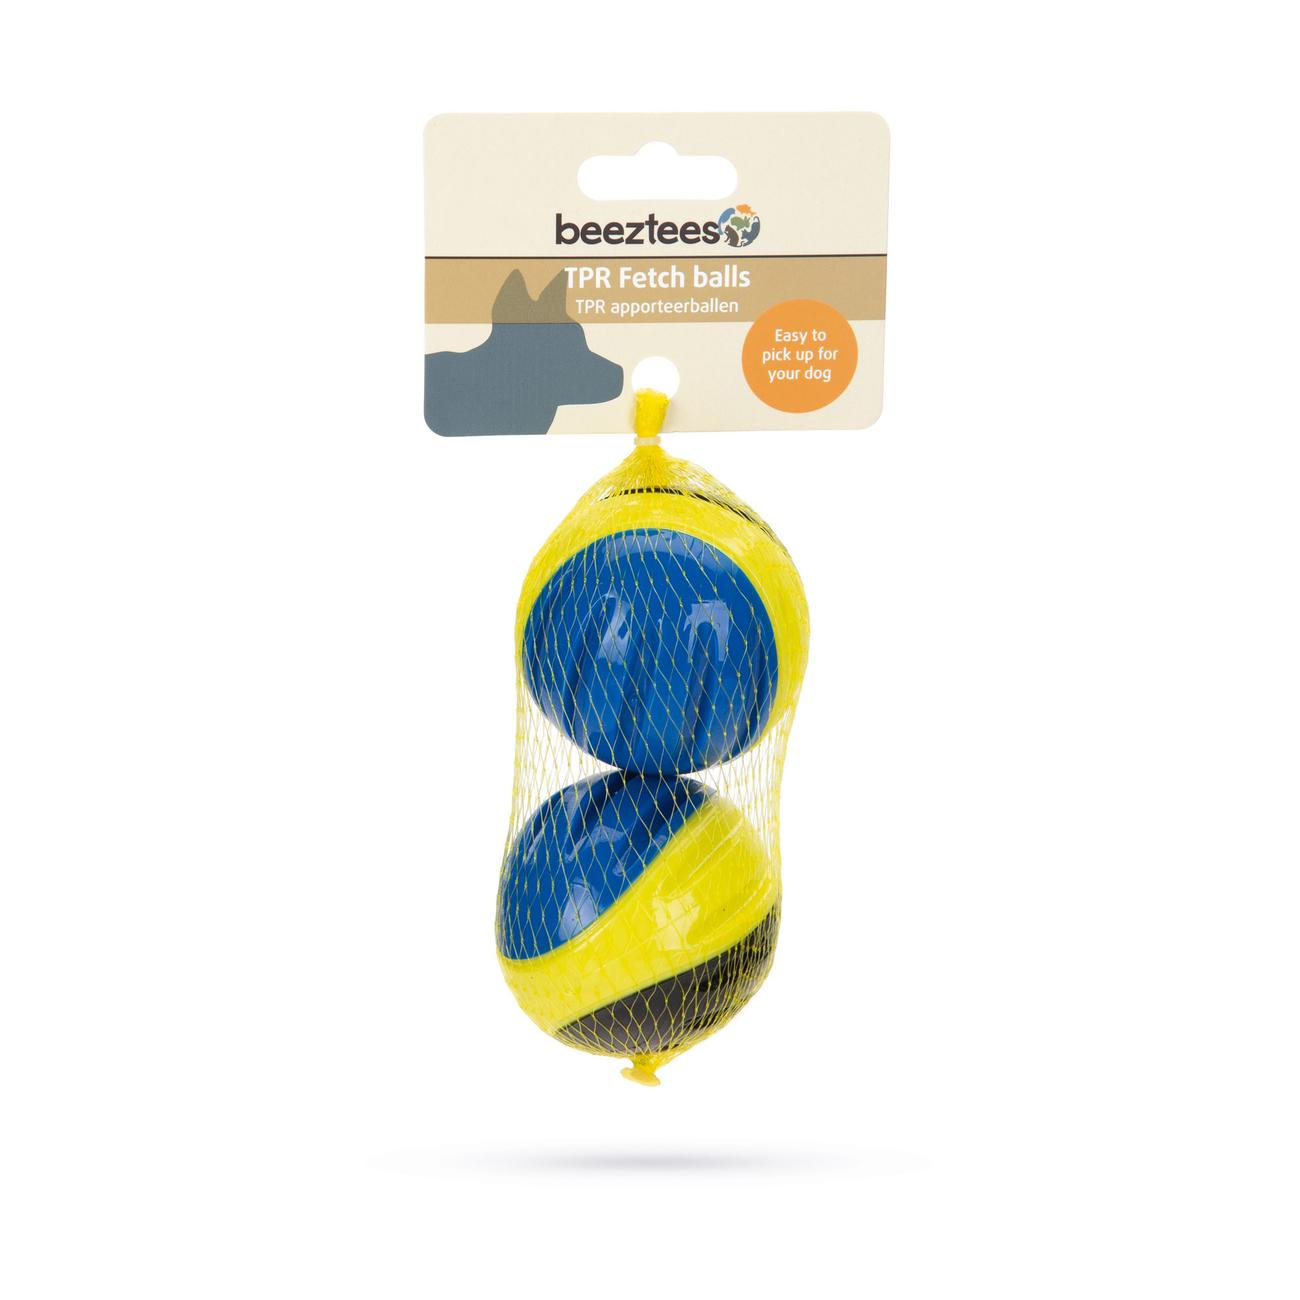 Beeztees Fetch TPR Ball Hundespielzeug, Bild 2